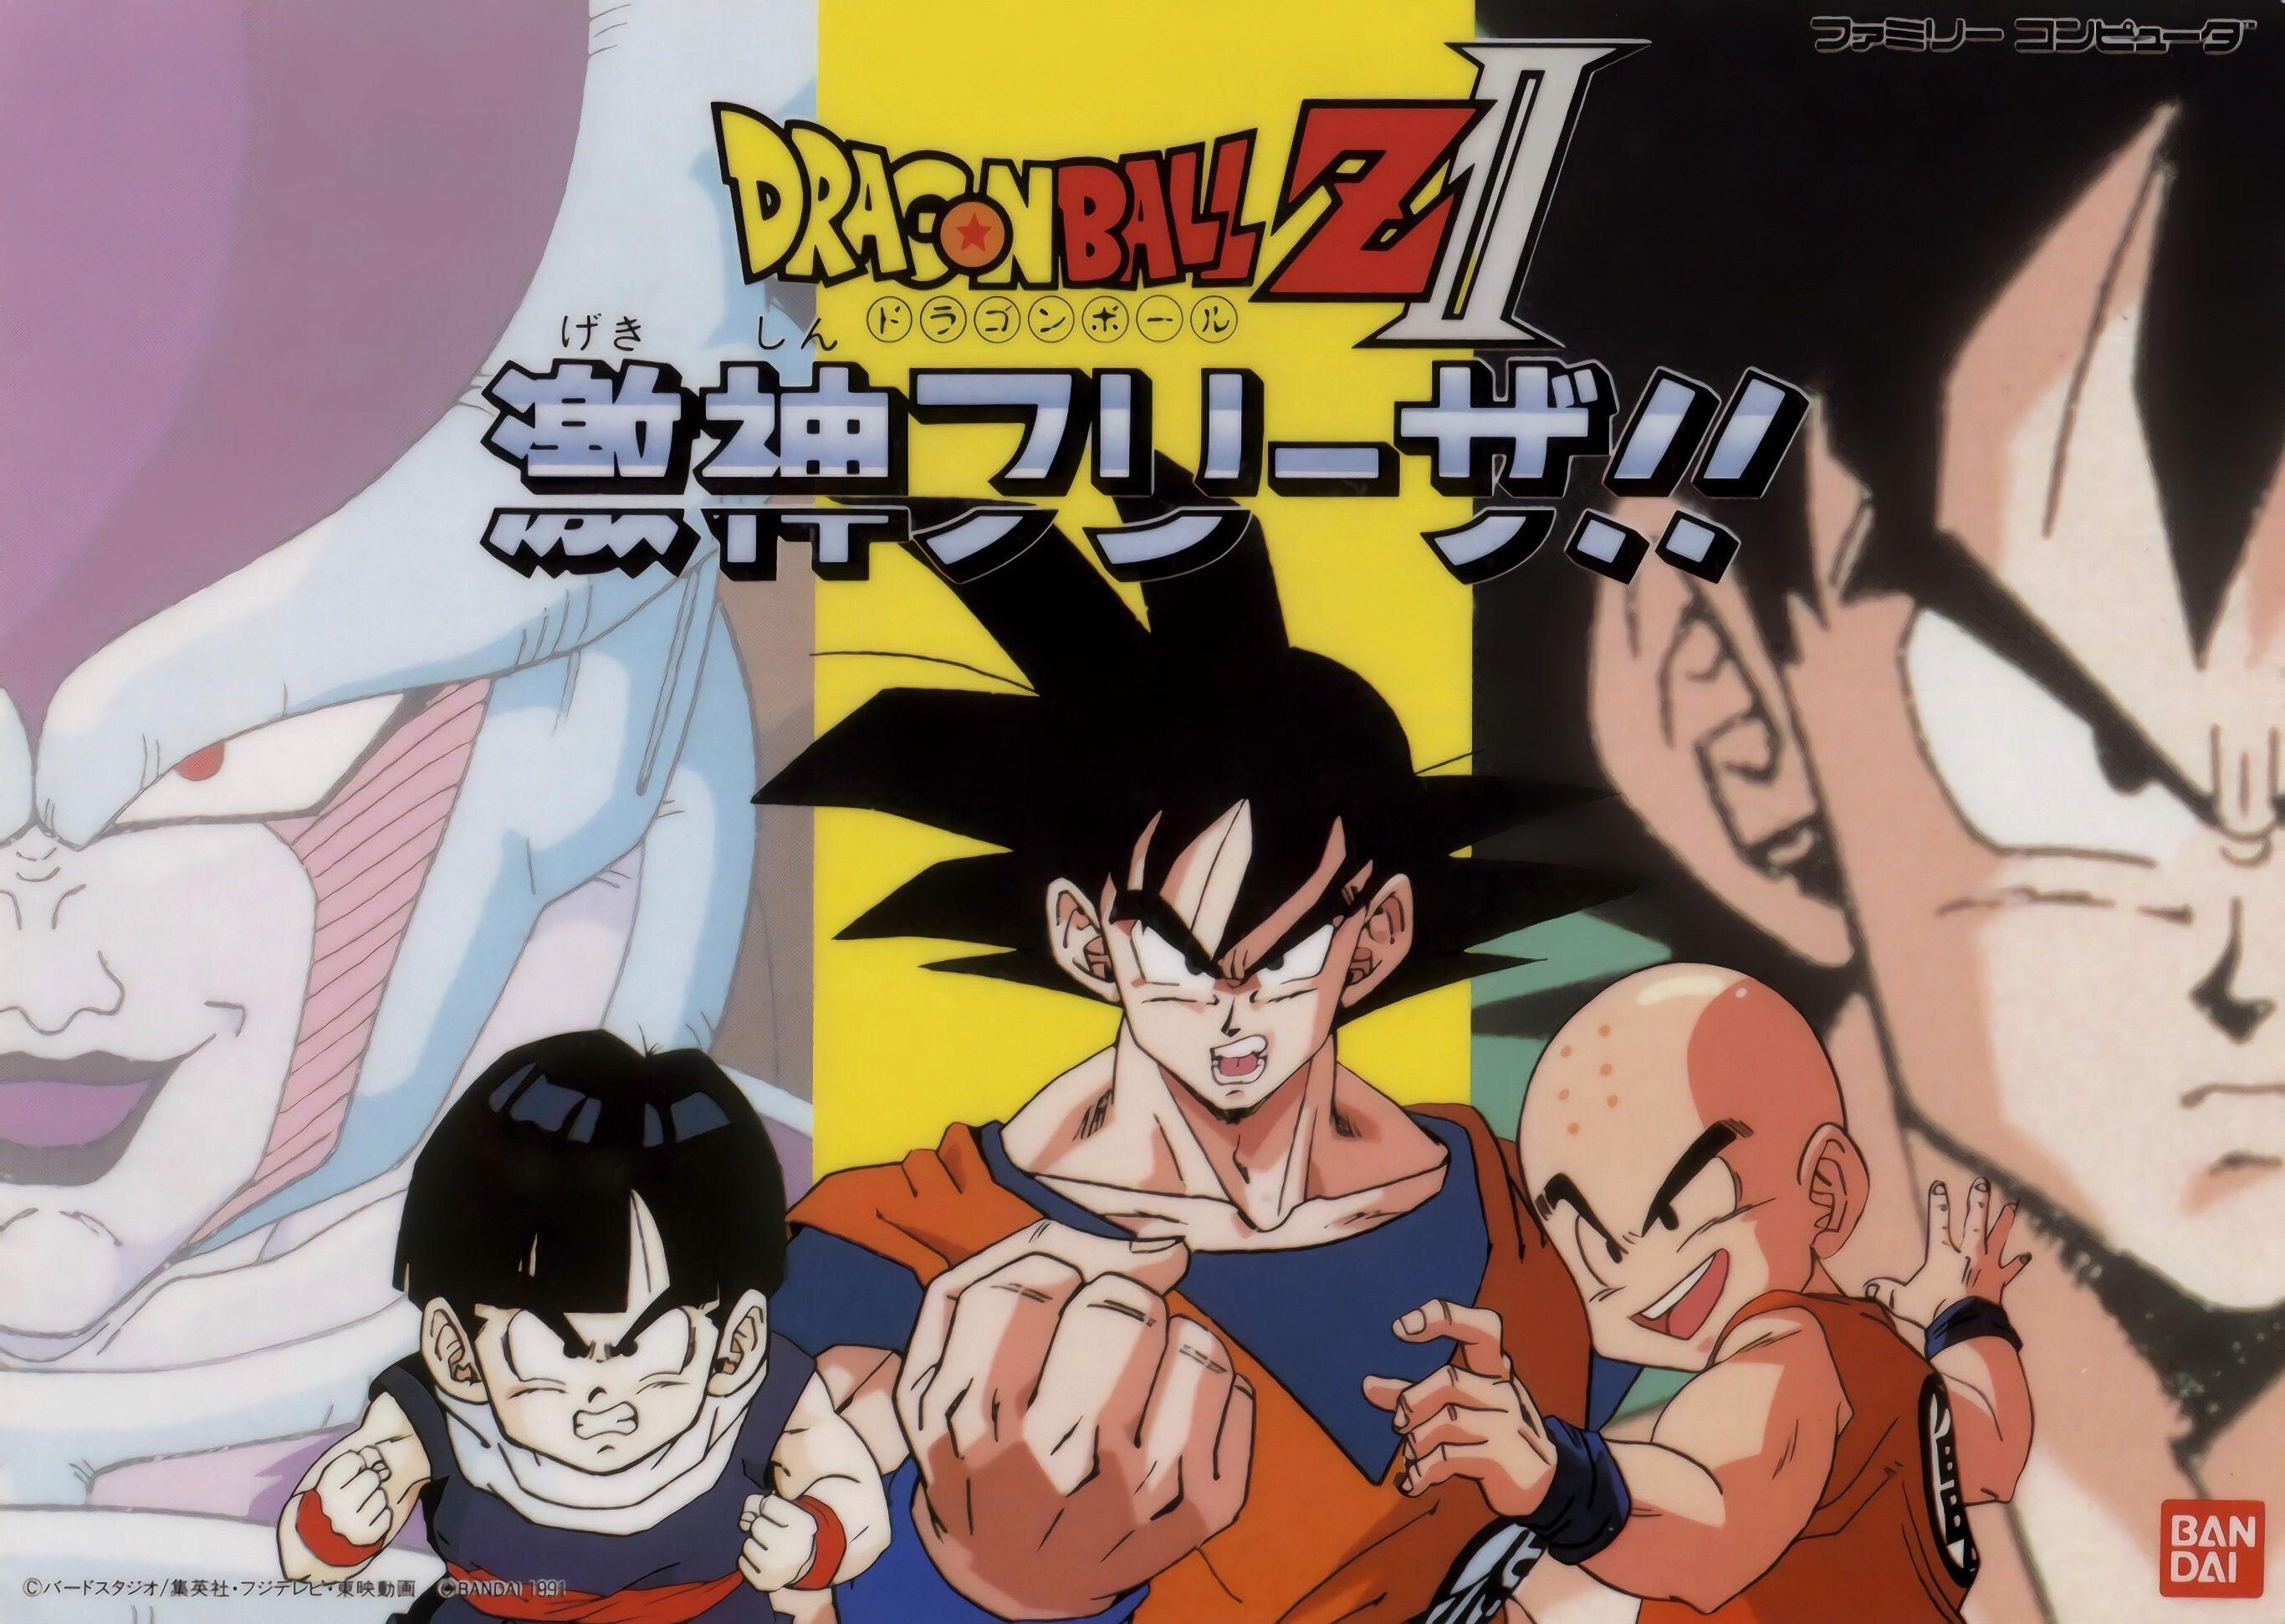 Pin de Eliazer en Dragon Ball (ドラゴン ボール ) Akira Toriyama